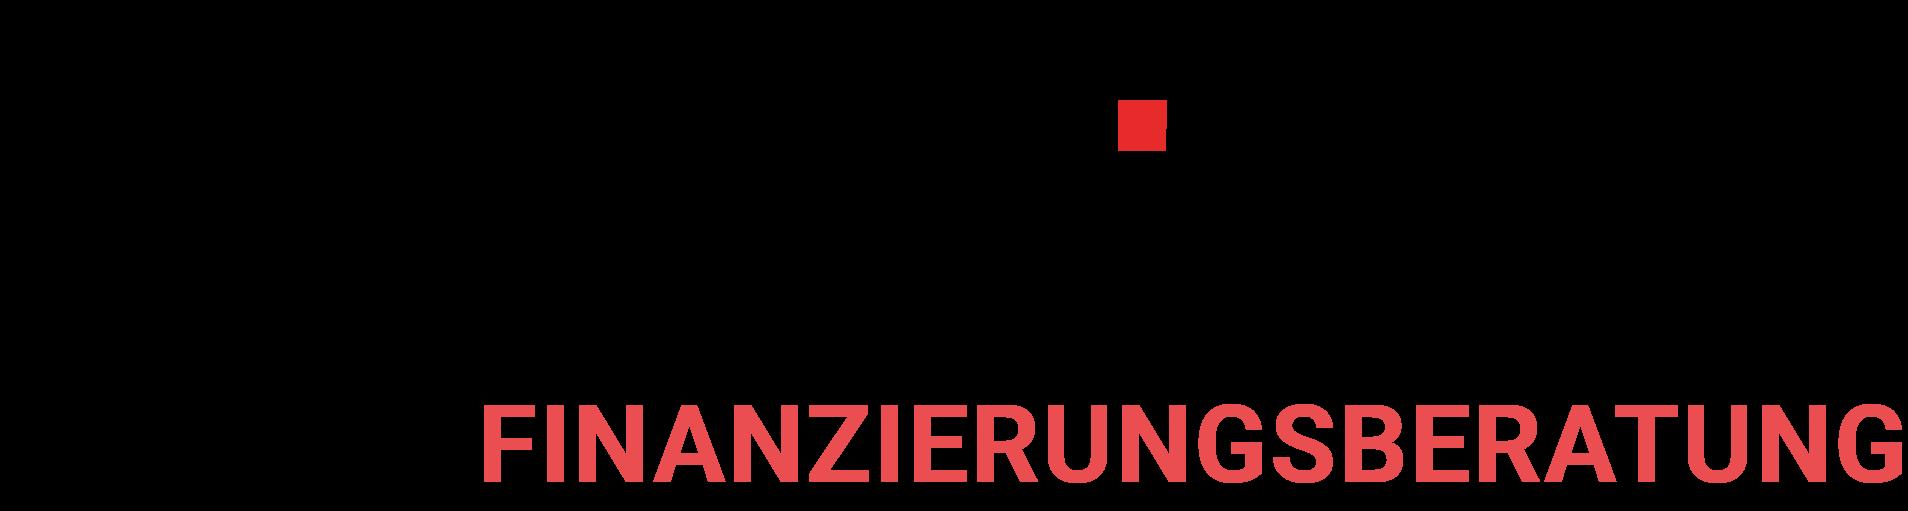 ACCONSIS Finanzberatung - Logo